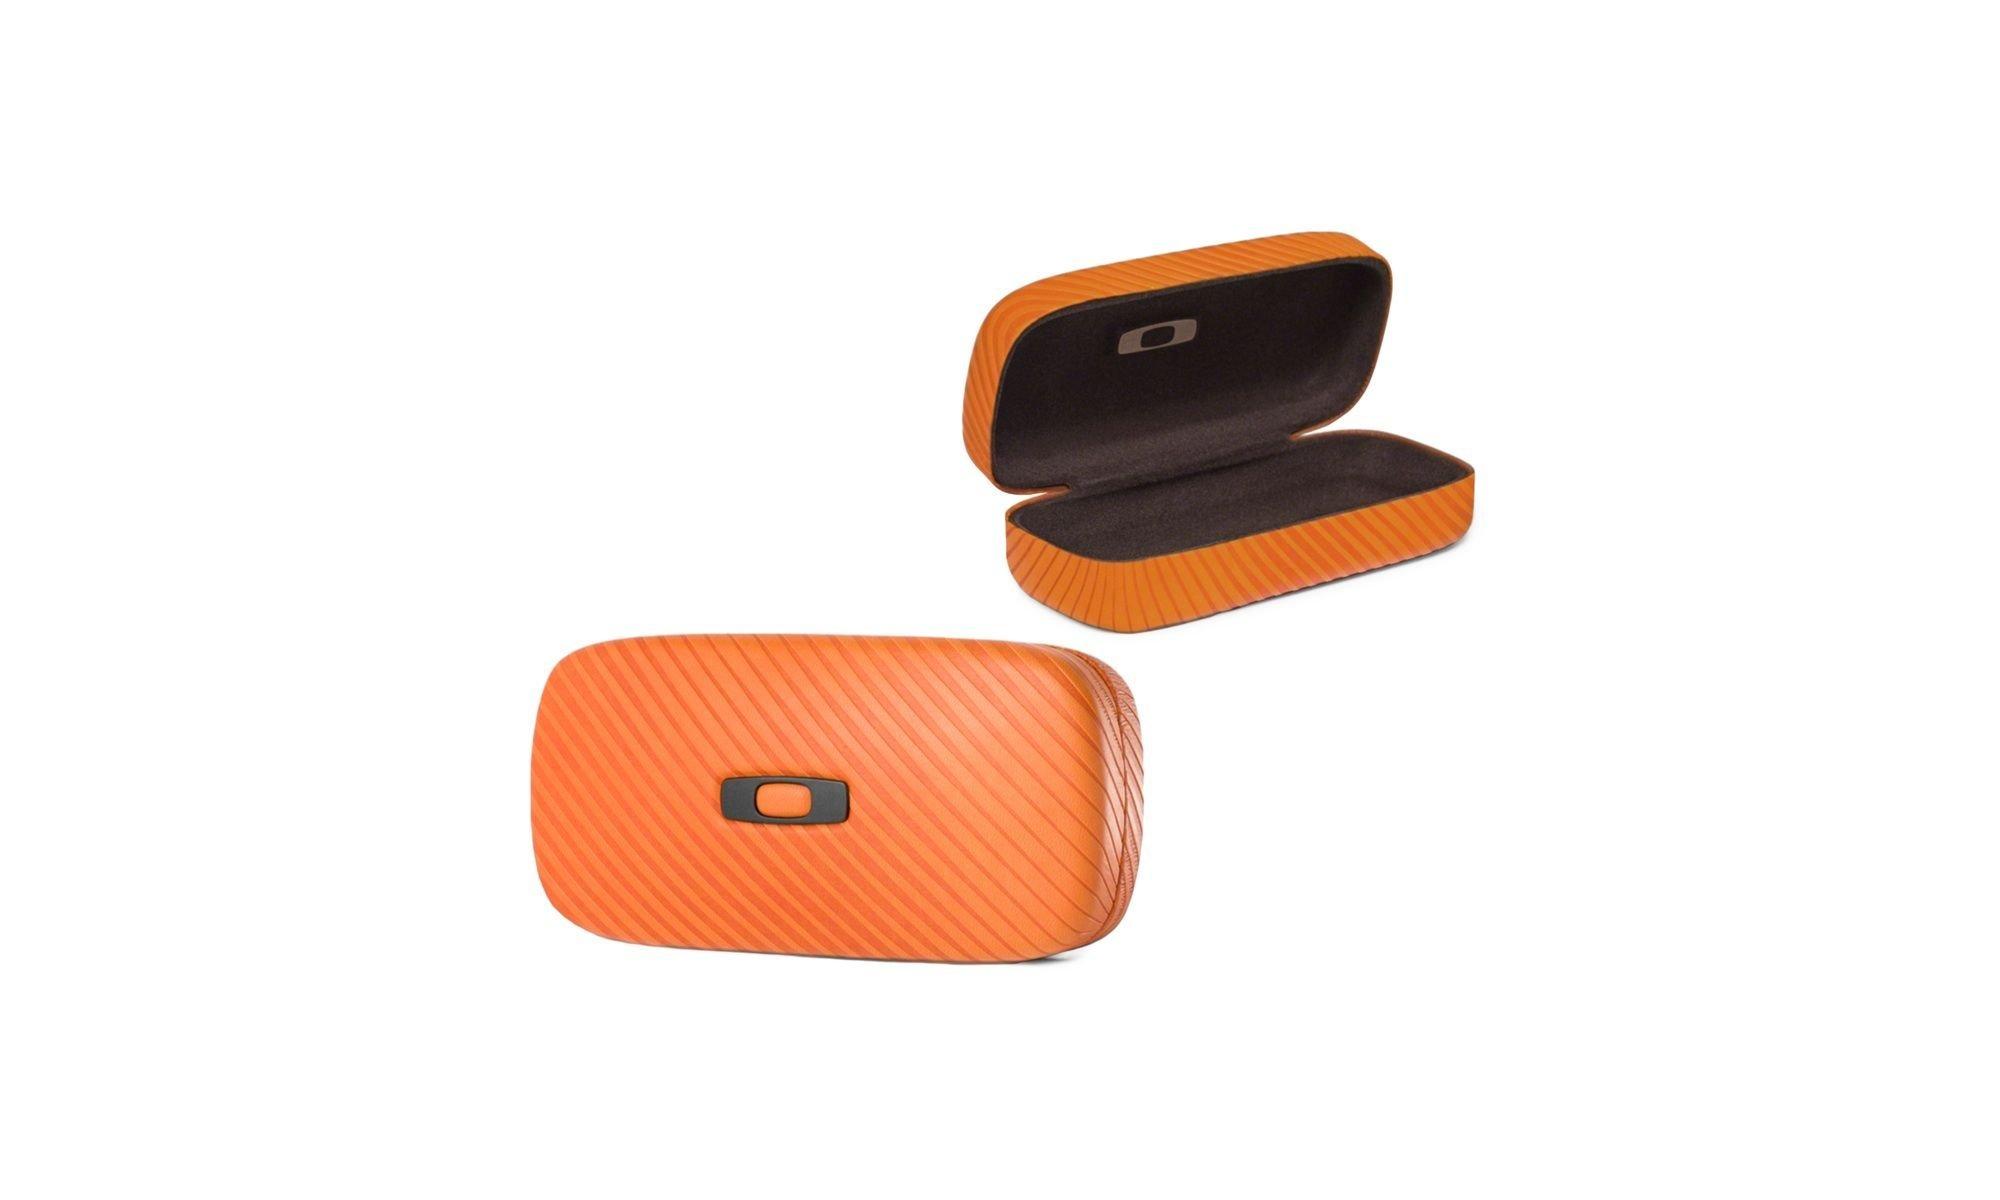 Oakley Square O Hard Men's Storage Case Sunglass Accessories - Persimmon / One Size by Oakley